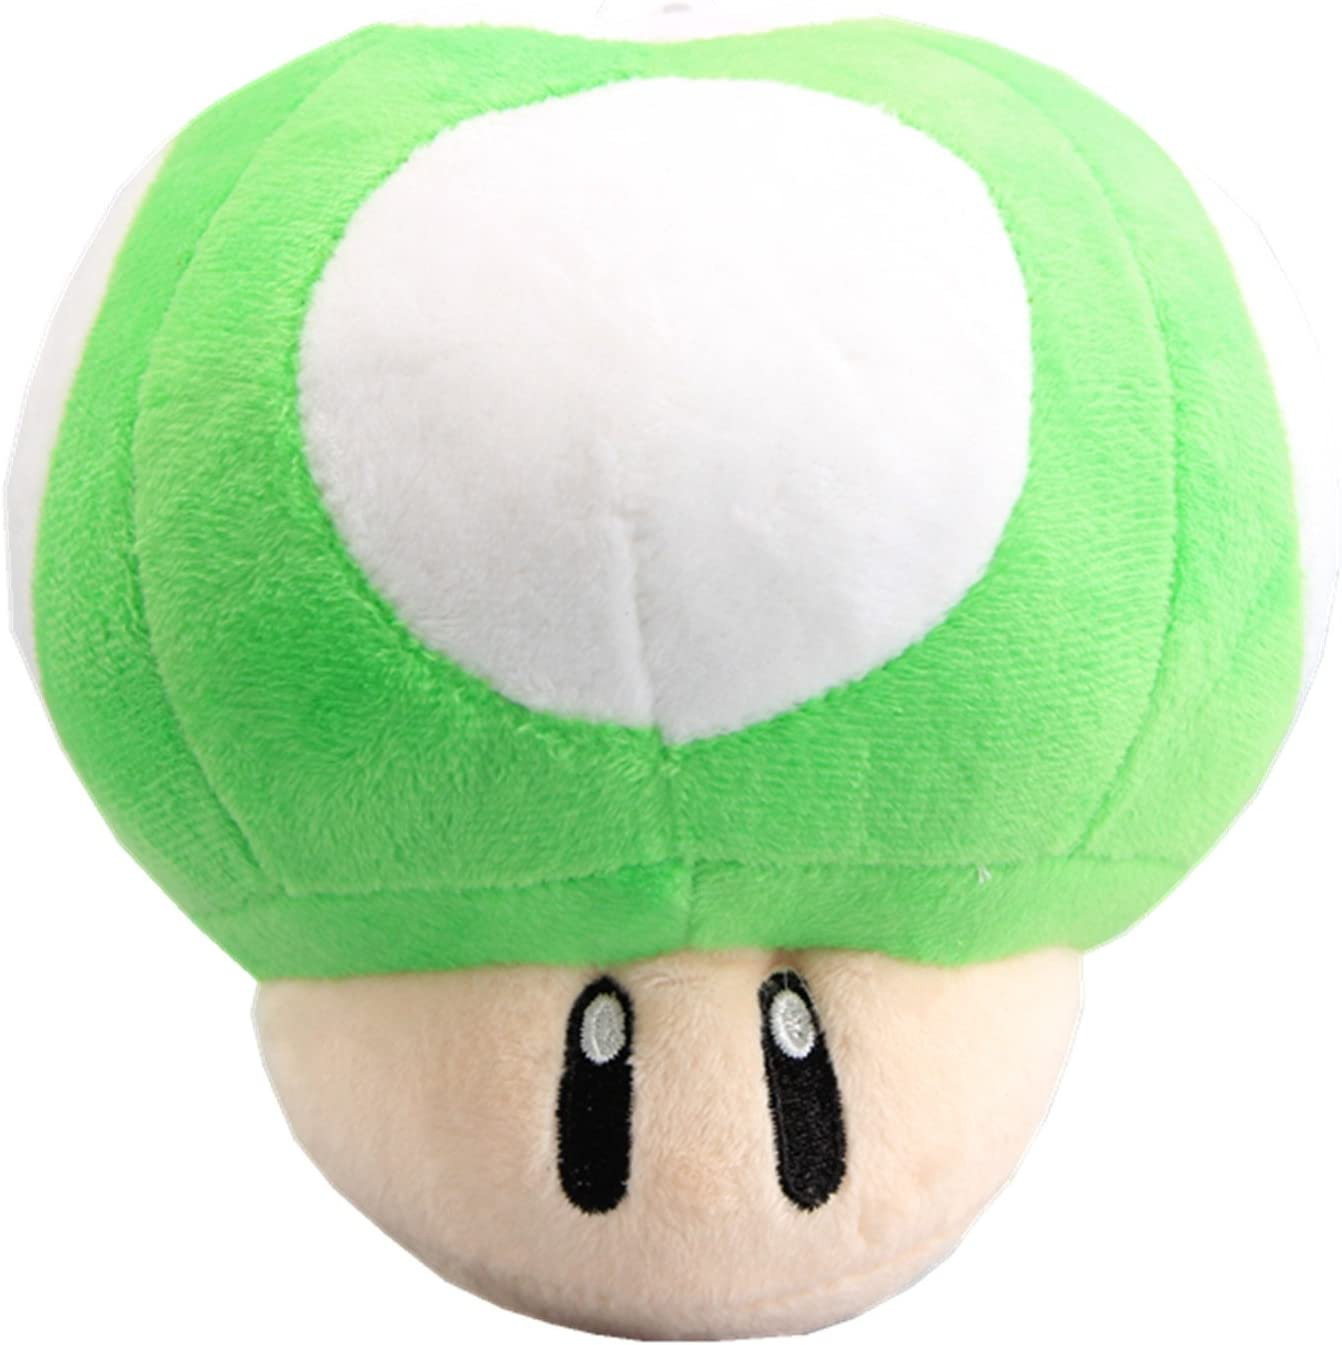 Amazon Com Uiuoutoy Super Mario Bros Green 1 Up Mushroom Stuffed